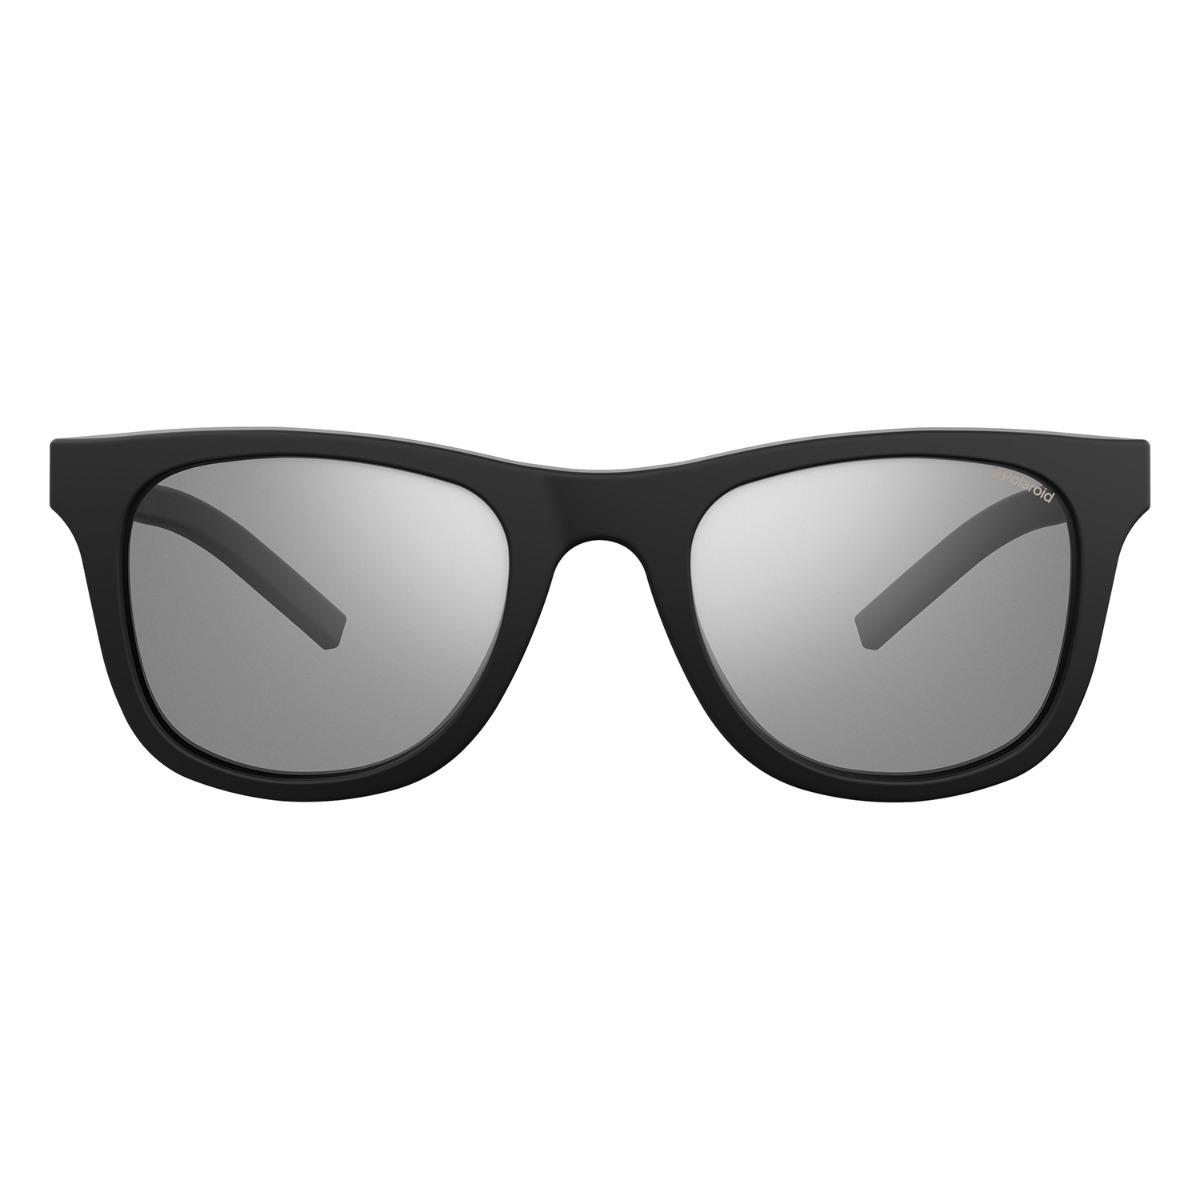 c03b736cd96a1 lentes de sol polaroid polarizado originales flexible 7020 s. Cargando zoom.